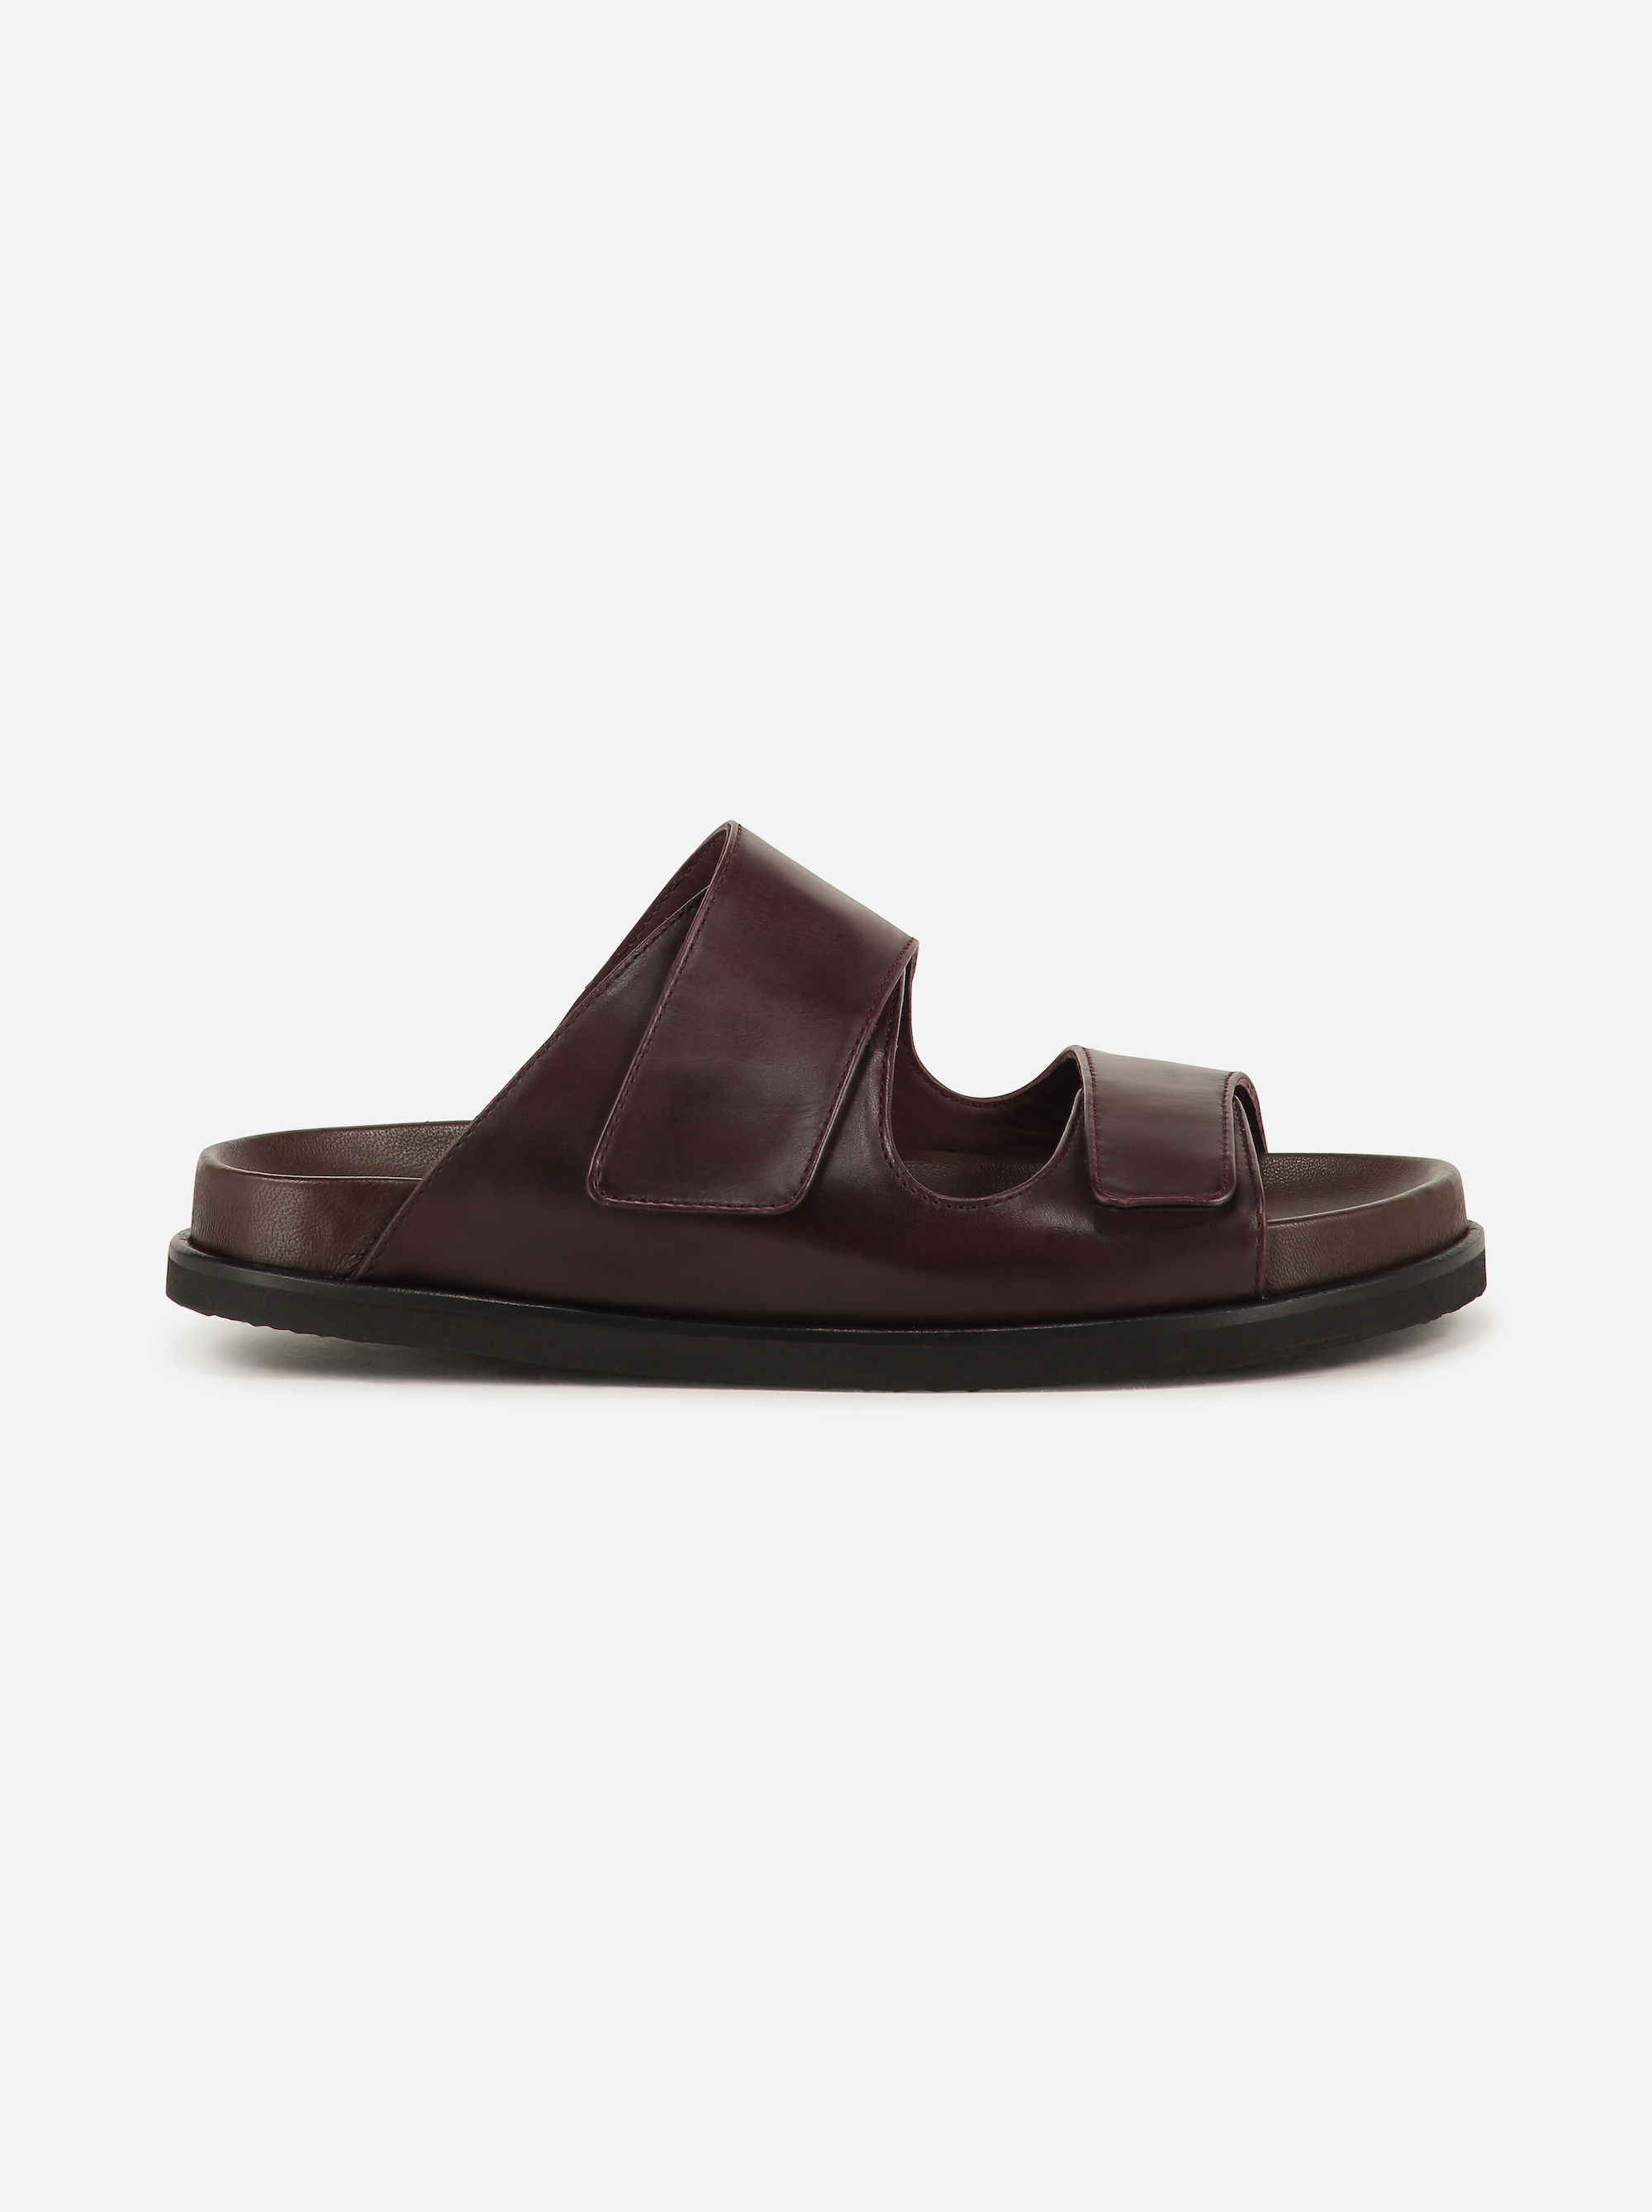 Teym - The Sandal - Burgundy - 1b